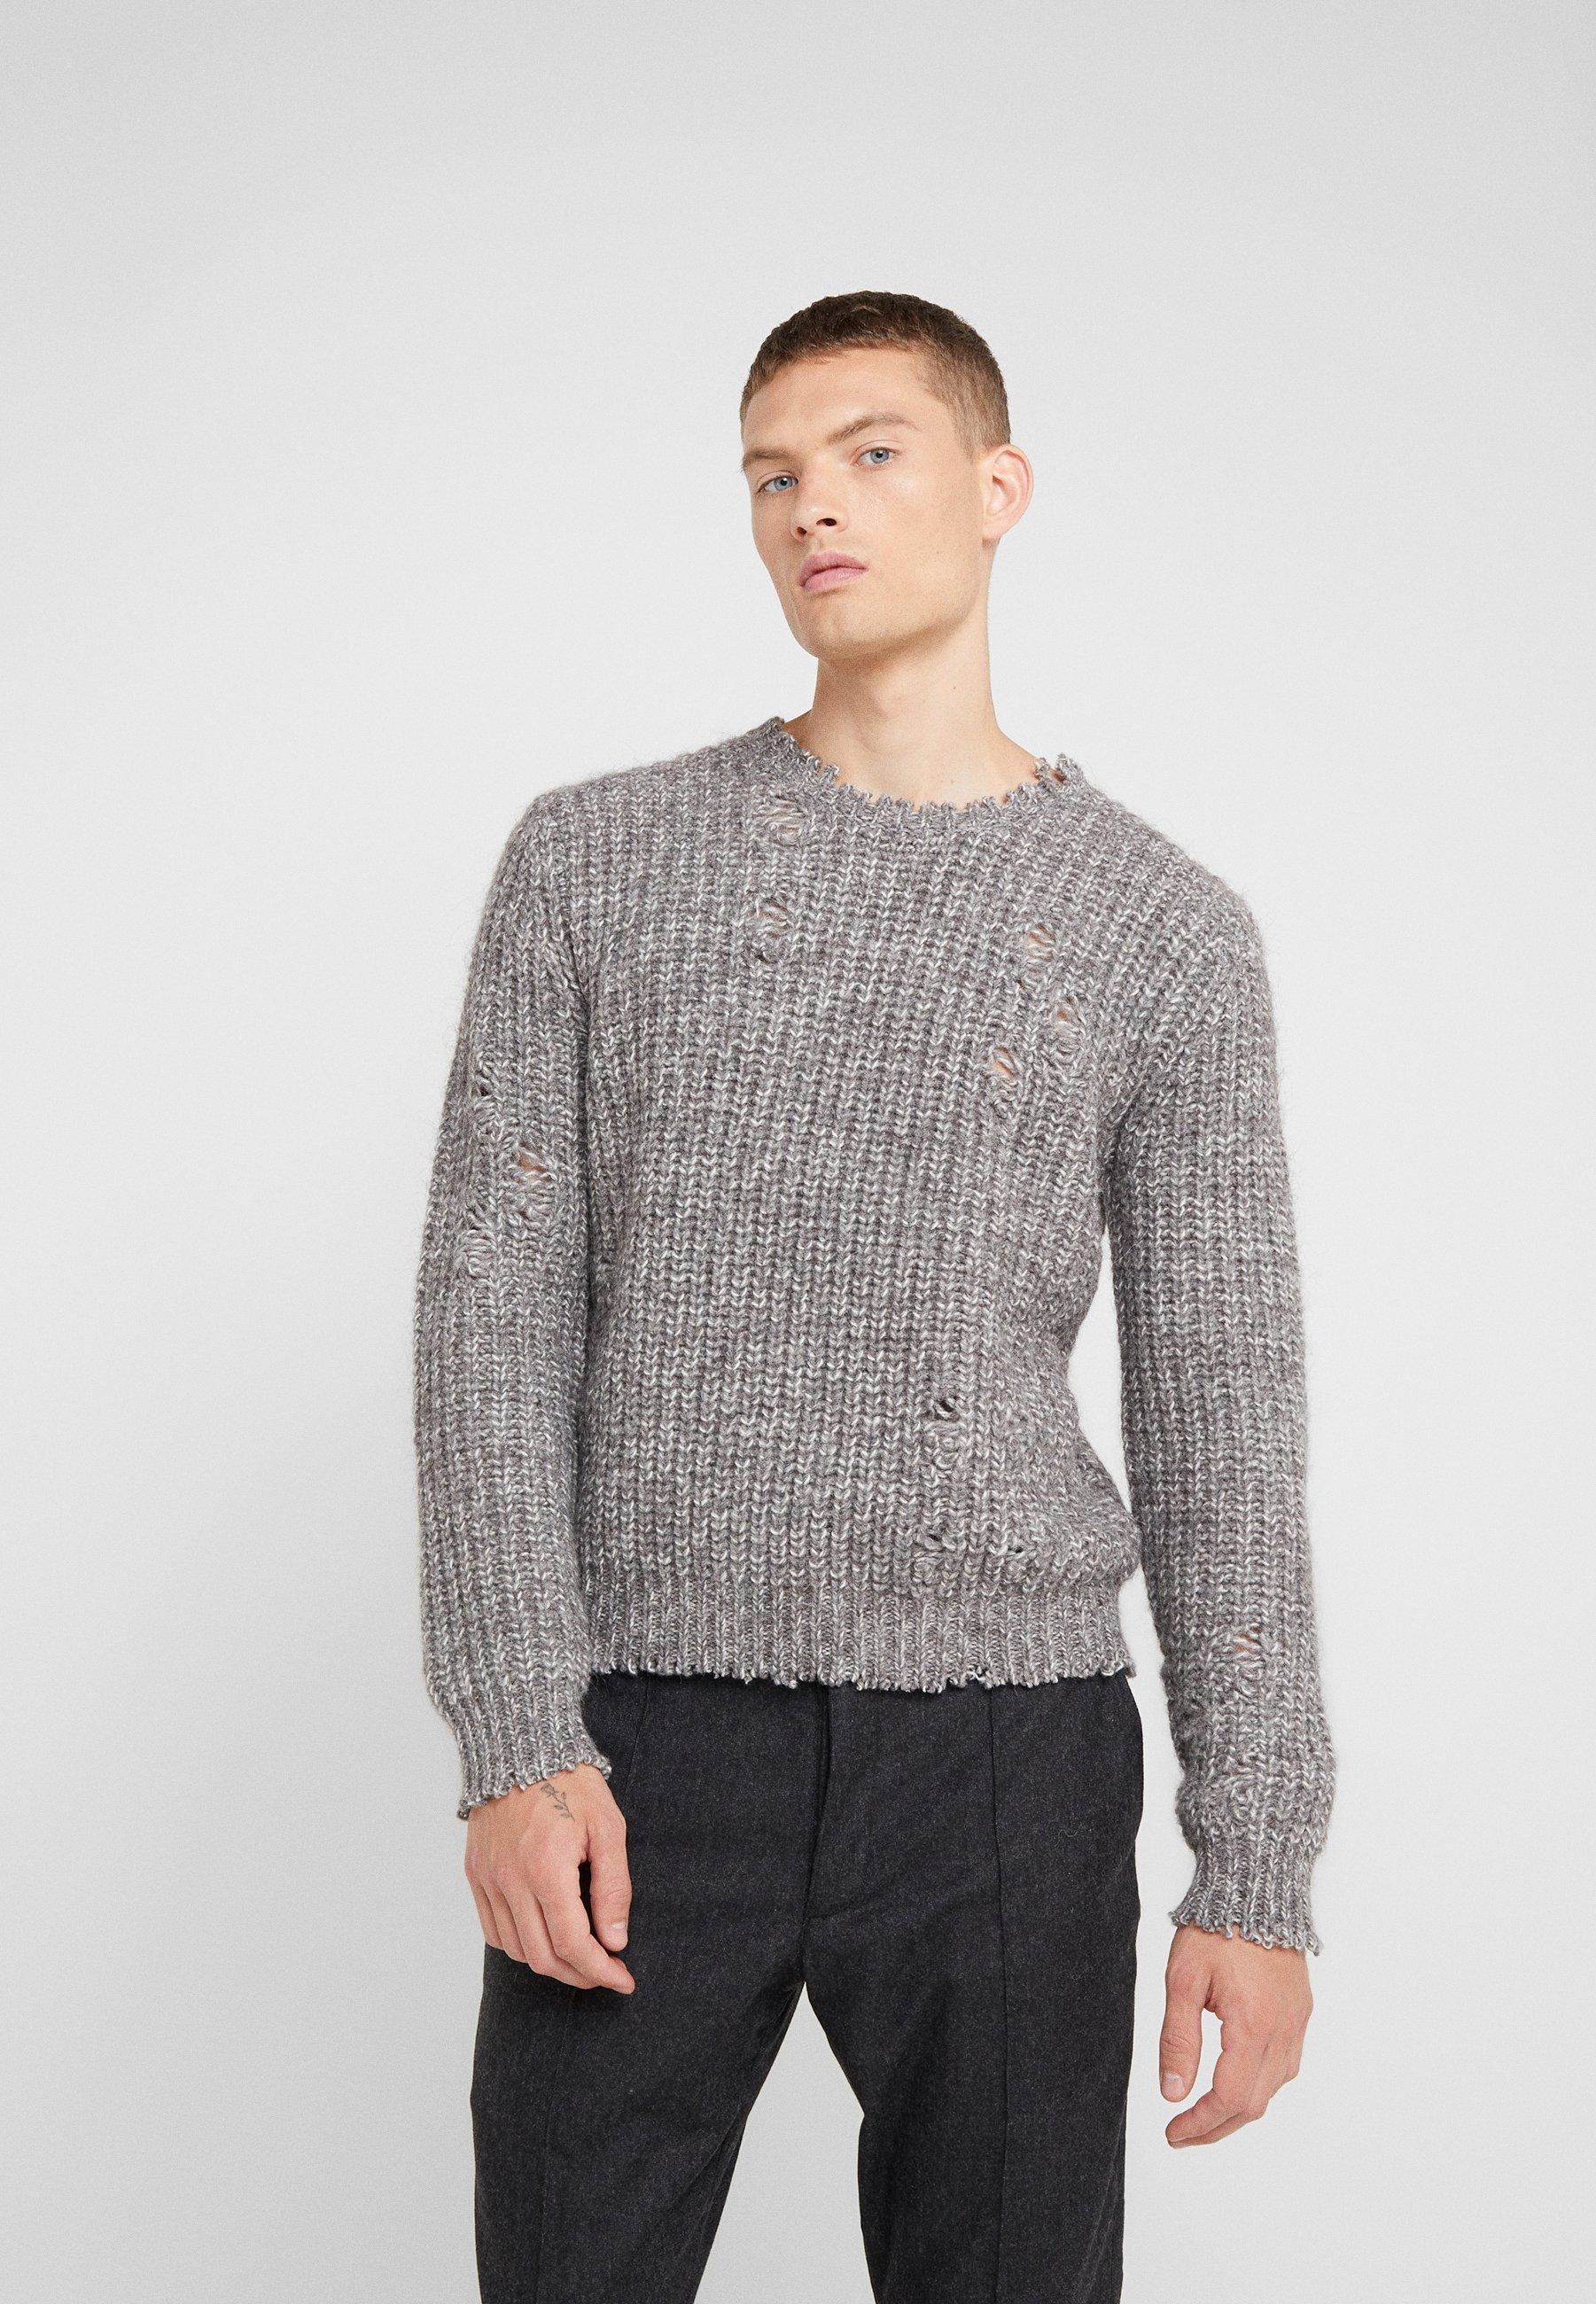 Grey Iro AlbaliPullover Mixed Grey AlbaliPullover Grey Mixed Iro AlbaliPullover Mixed Iro Iro w8P0Okn